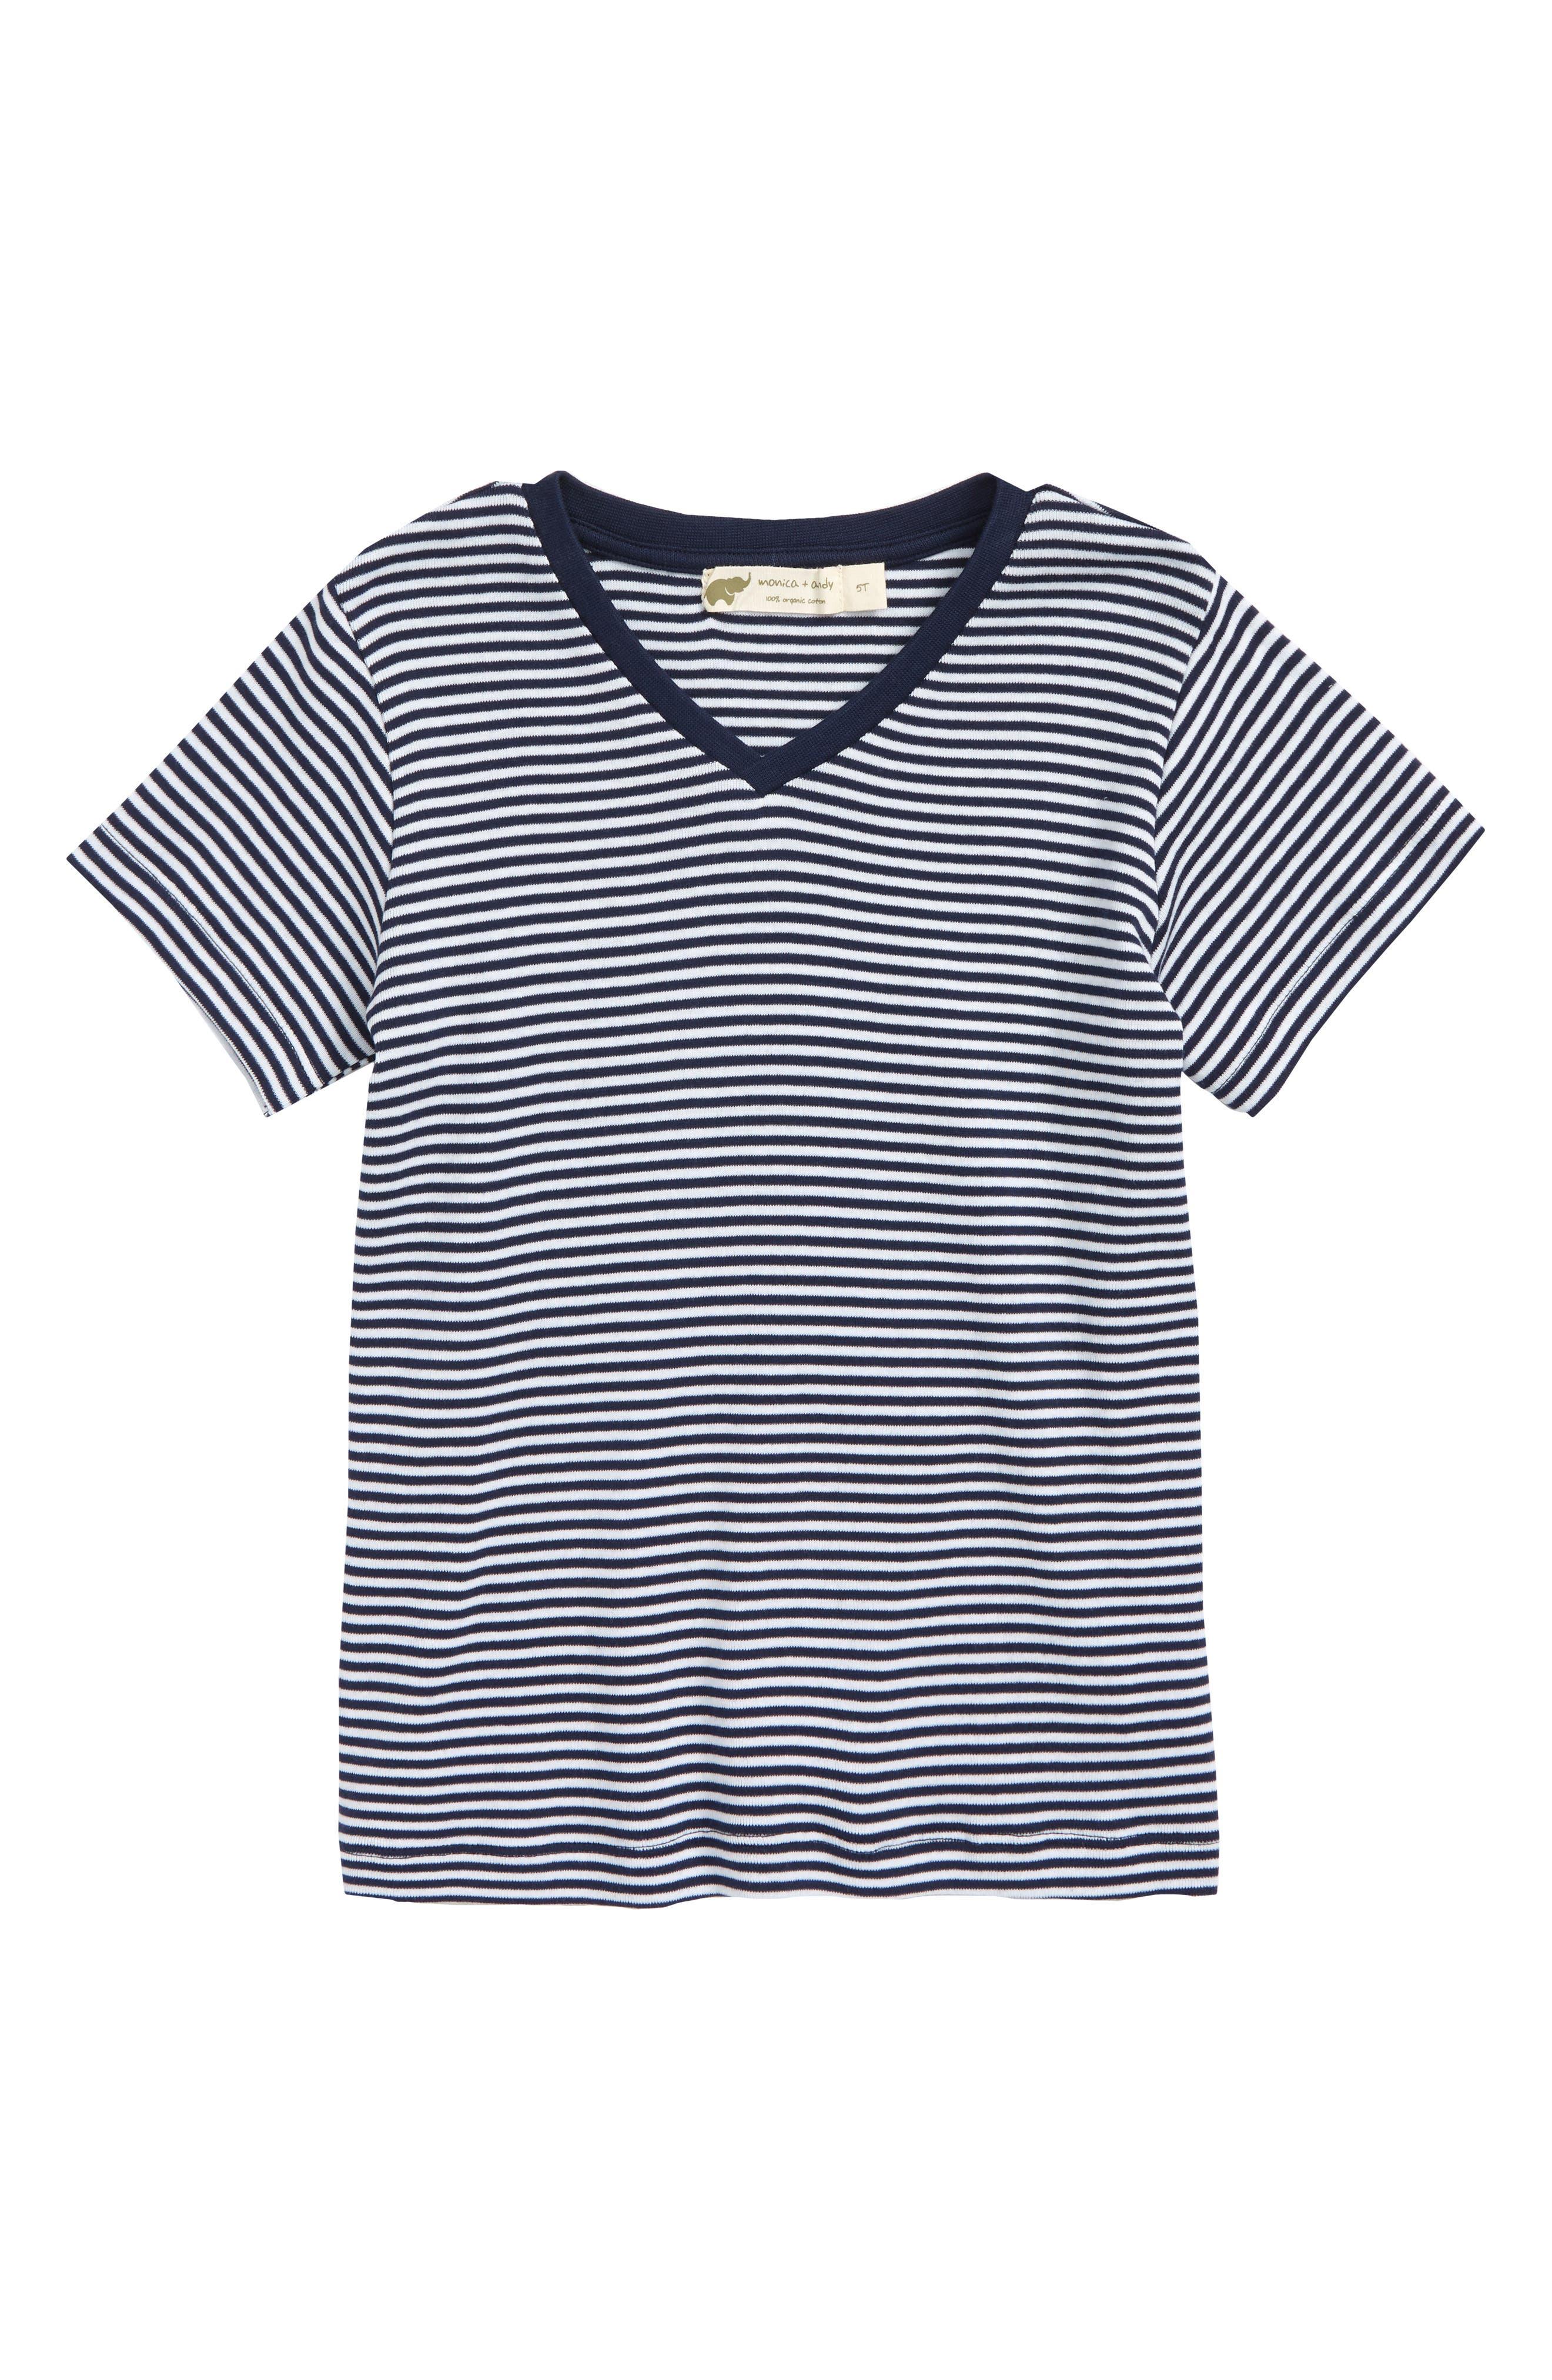 Stripe Organic Cotton T-Shirt,                             Main thumbnail 1, color,                             Navy/ White Stripe